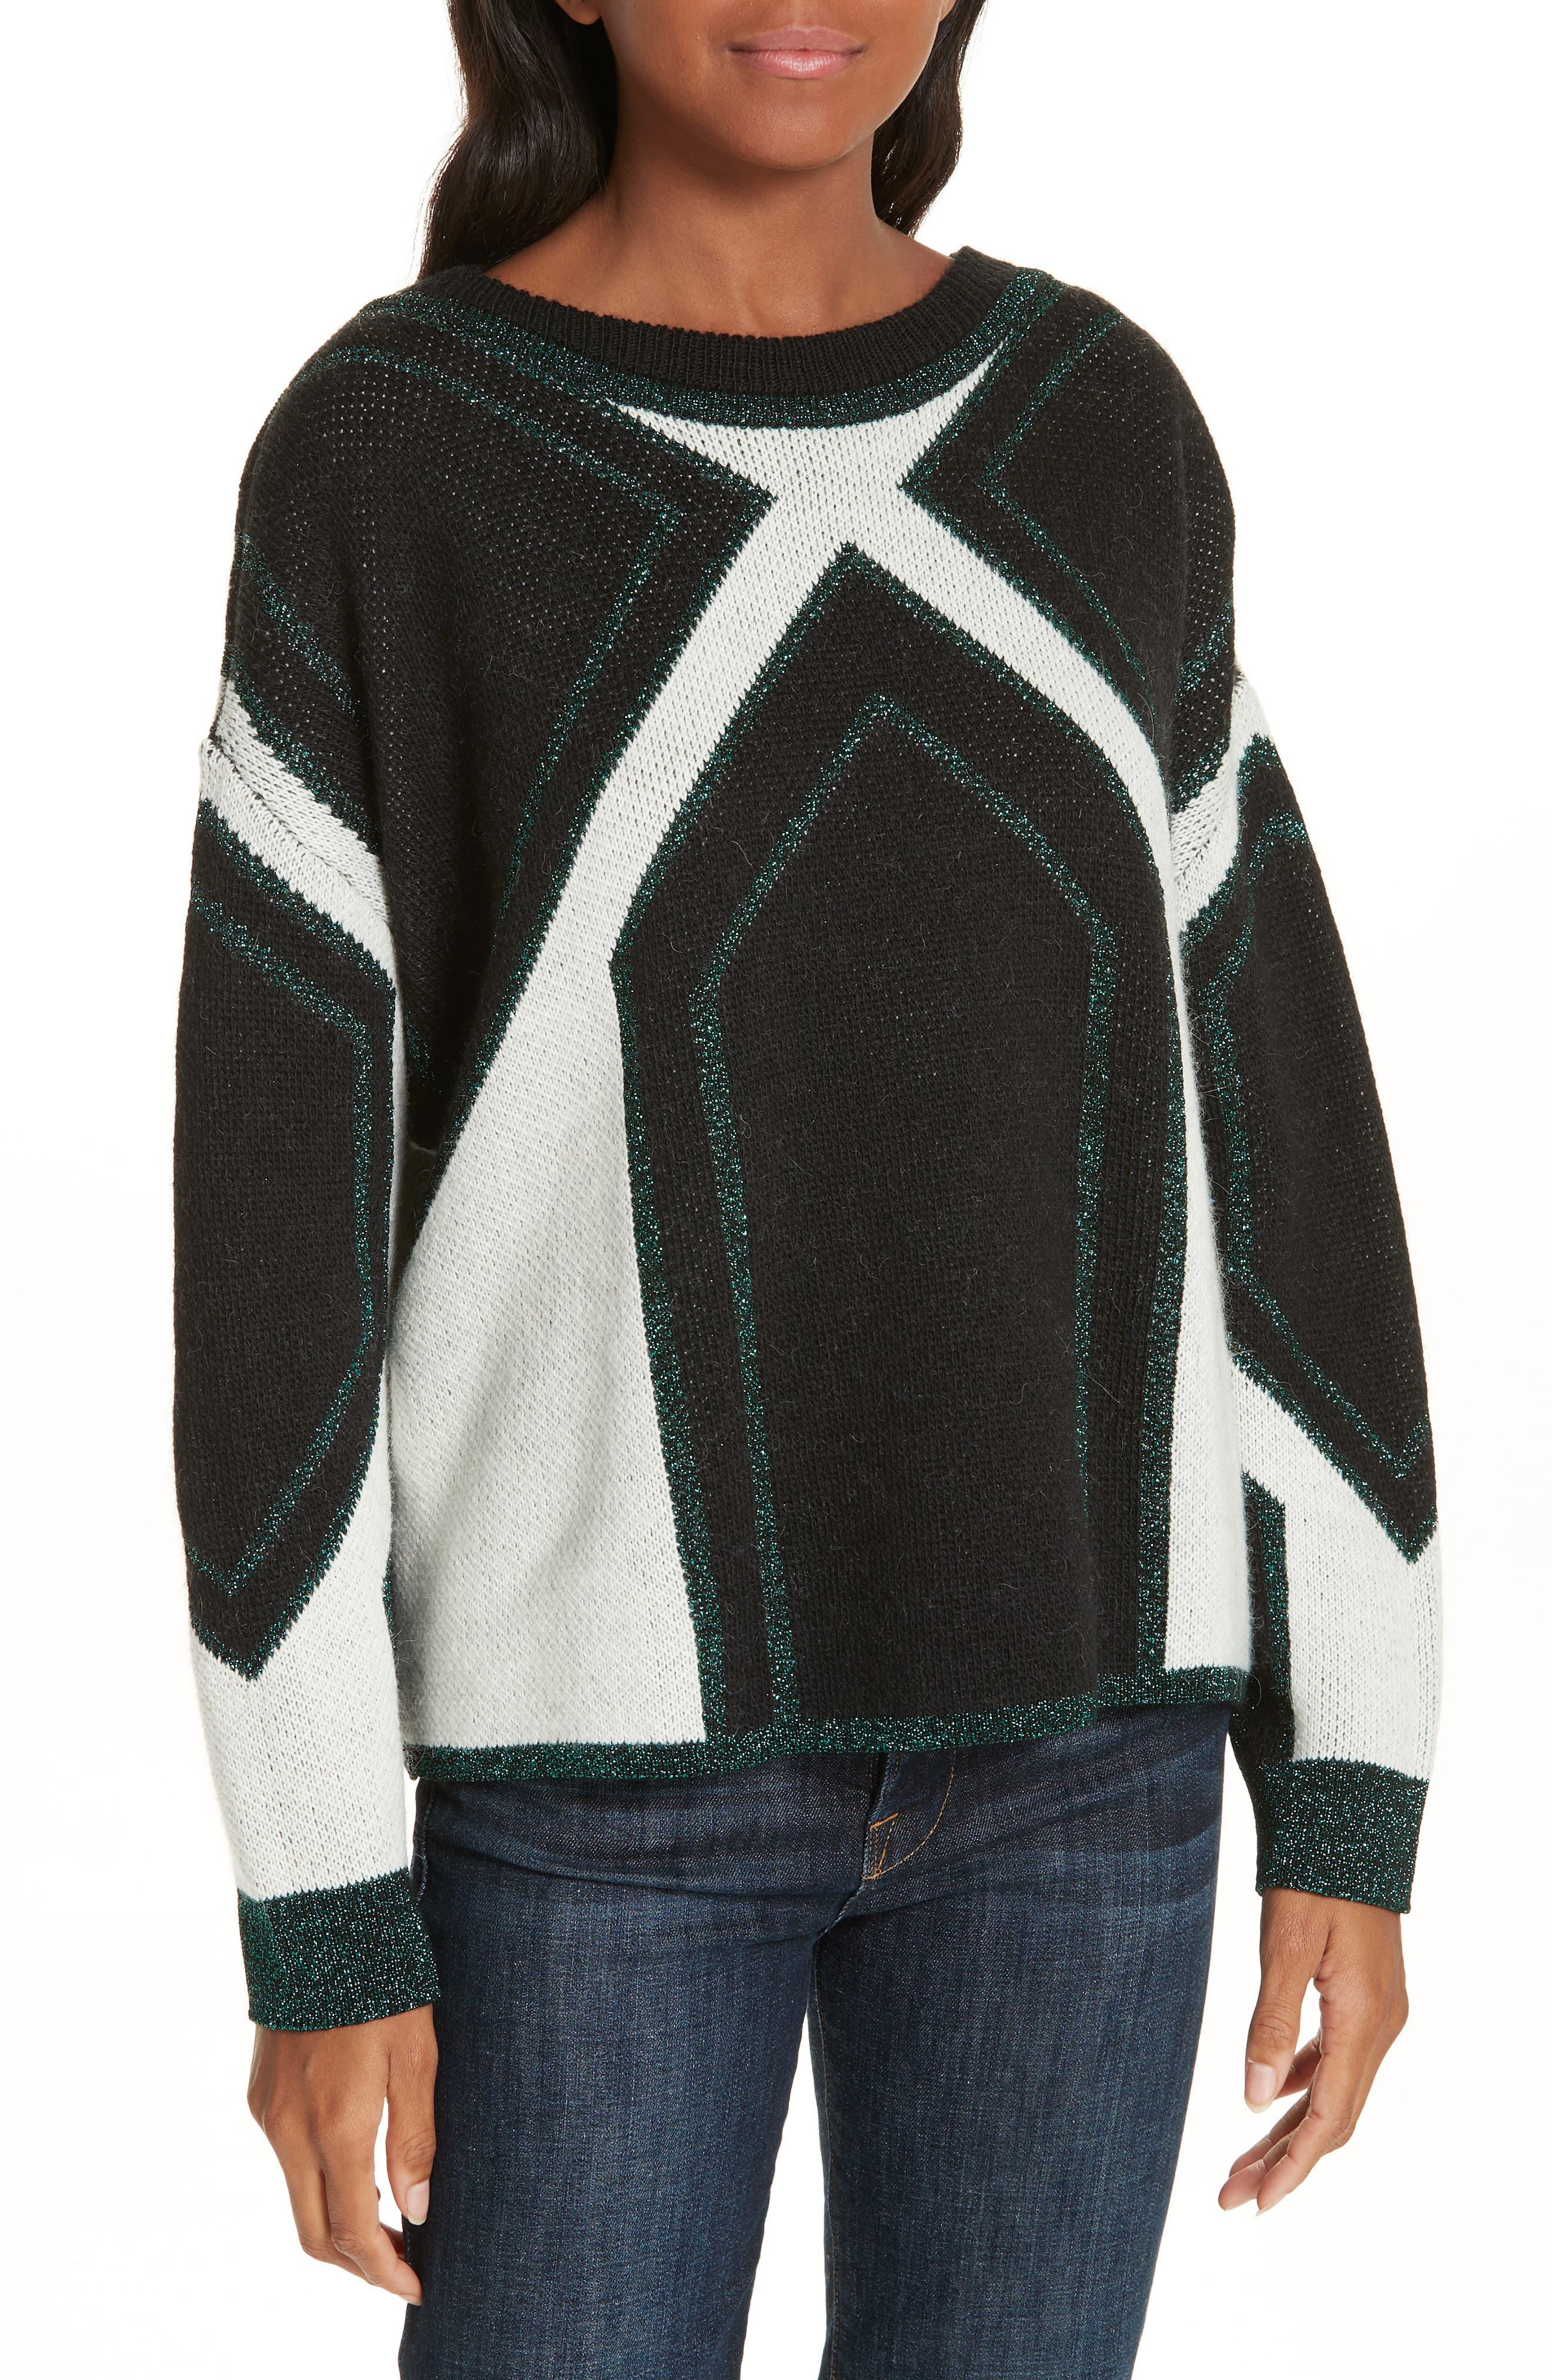 Velny Sweater,                         Main,                         color, MULTI